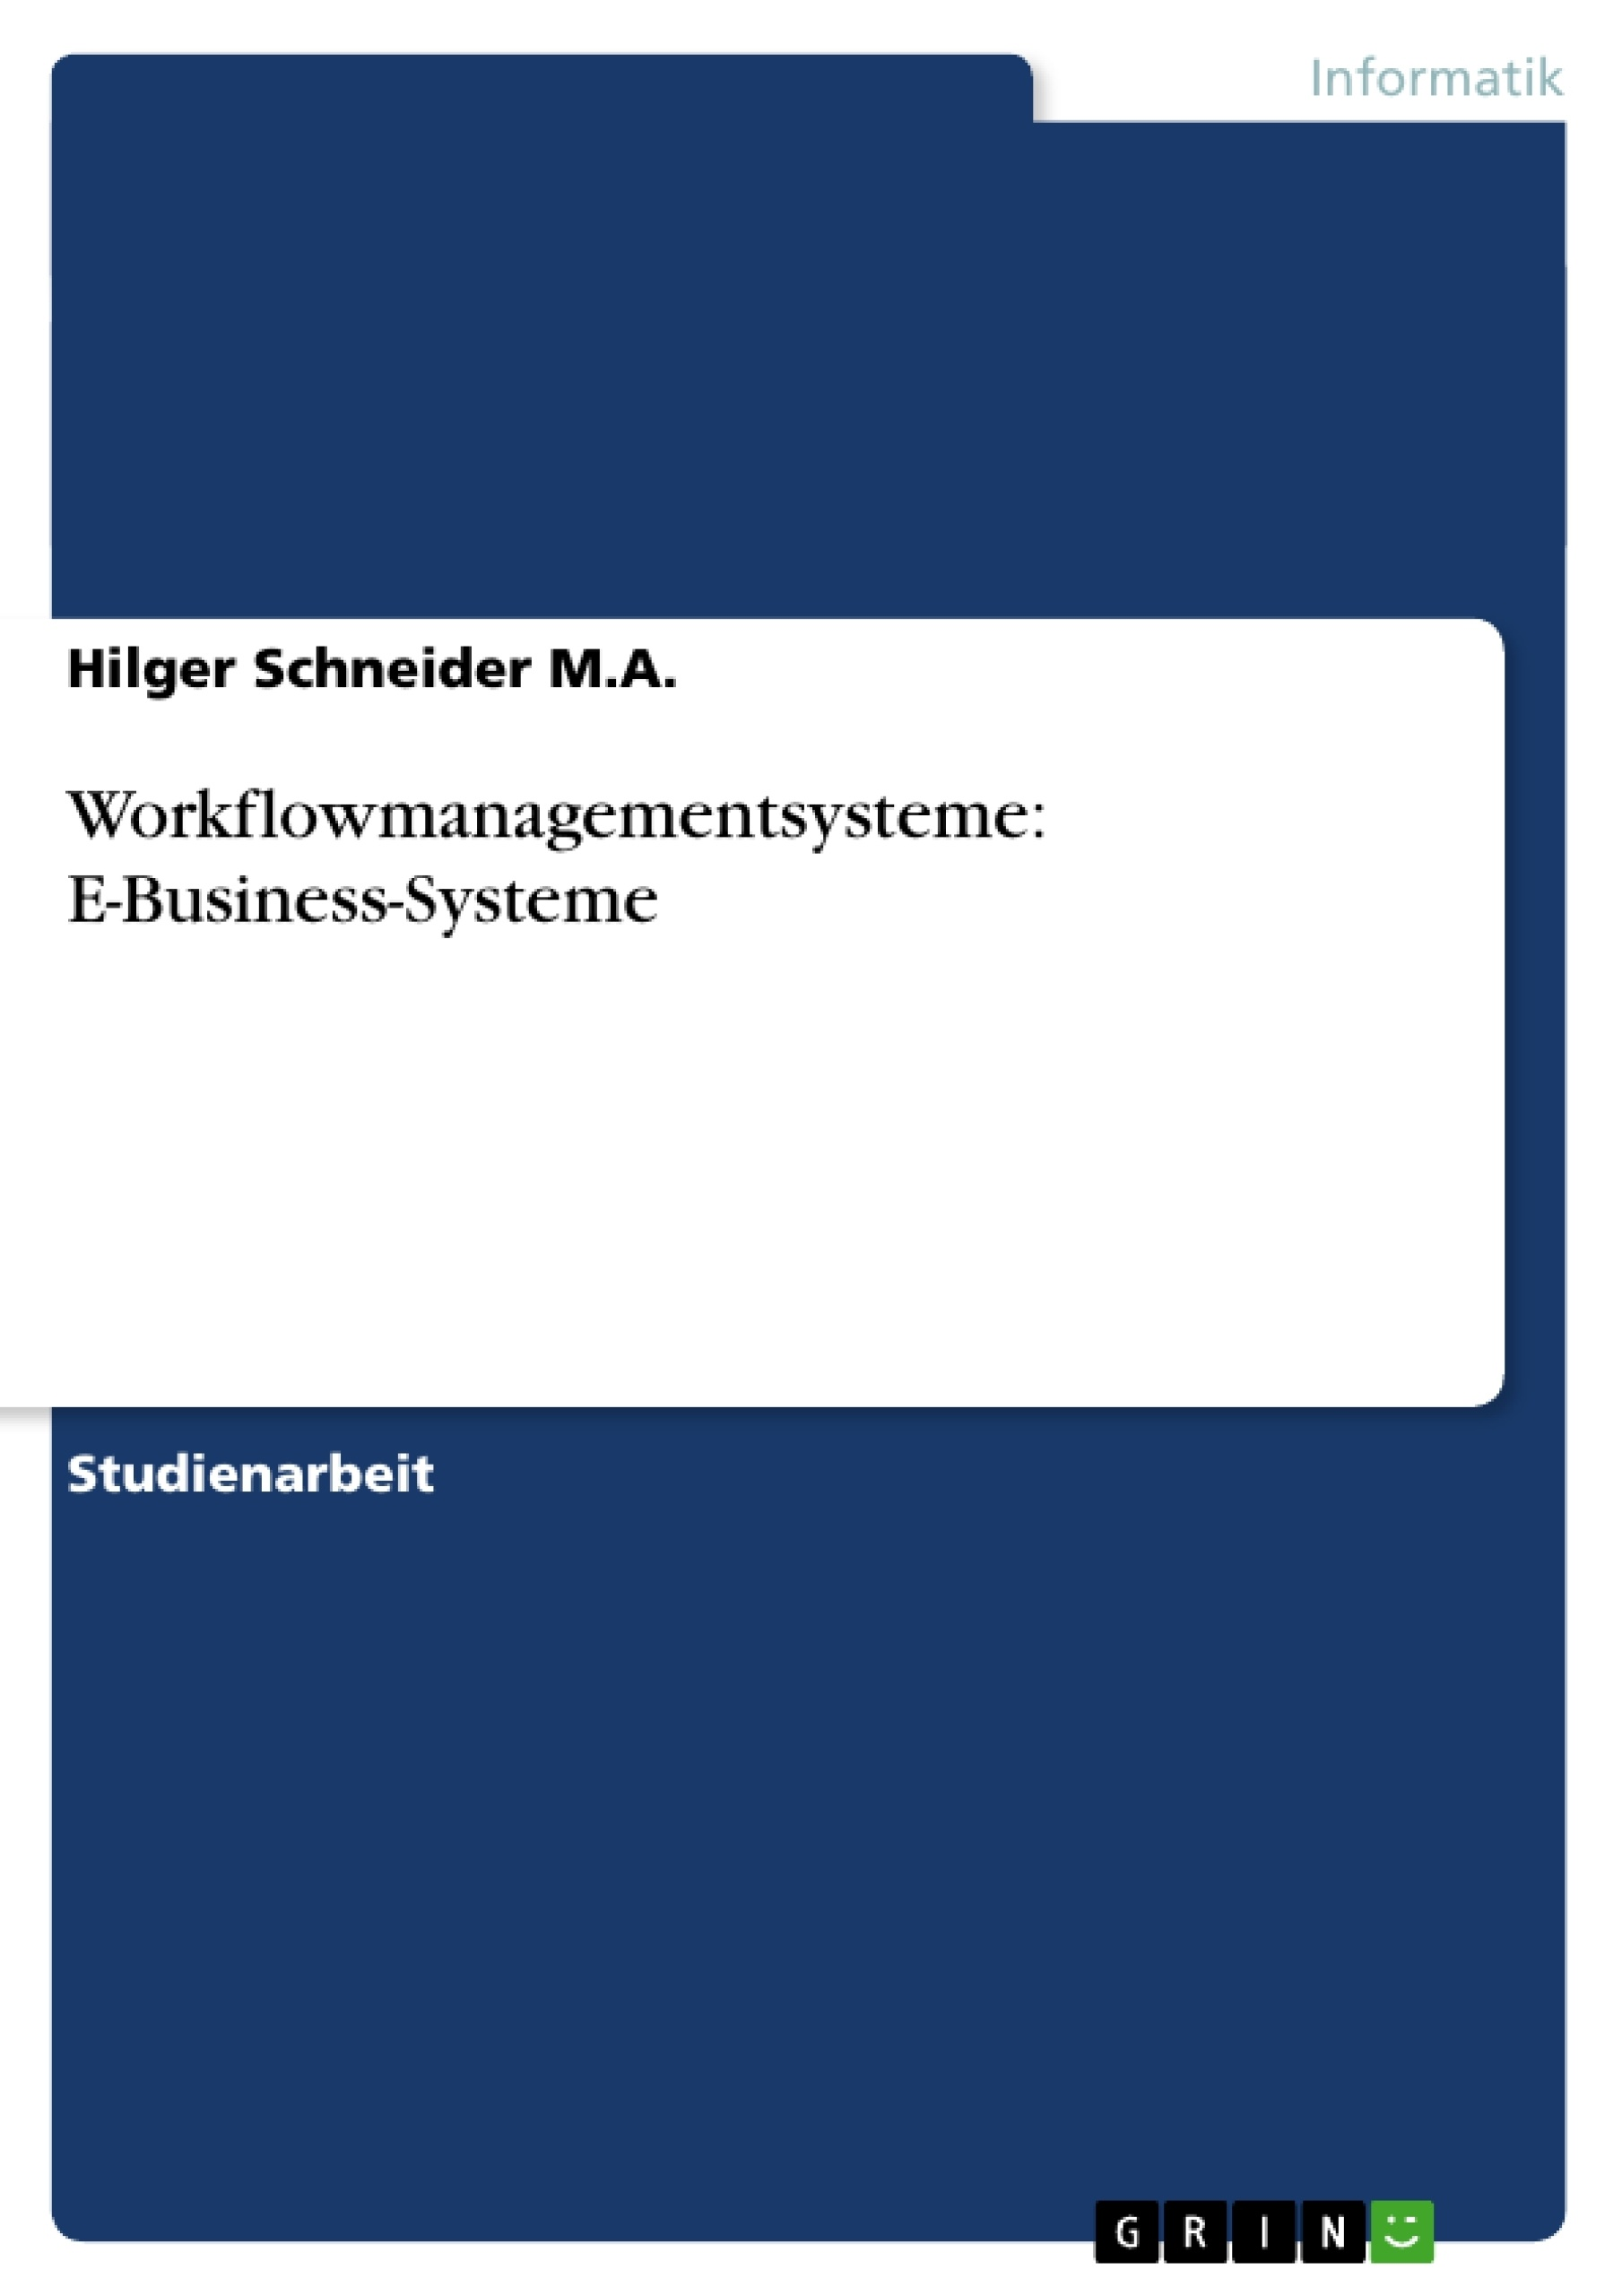 Titel: Workflowmanagementsysteme: E-Business-Systeme